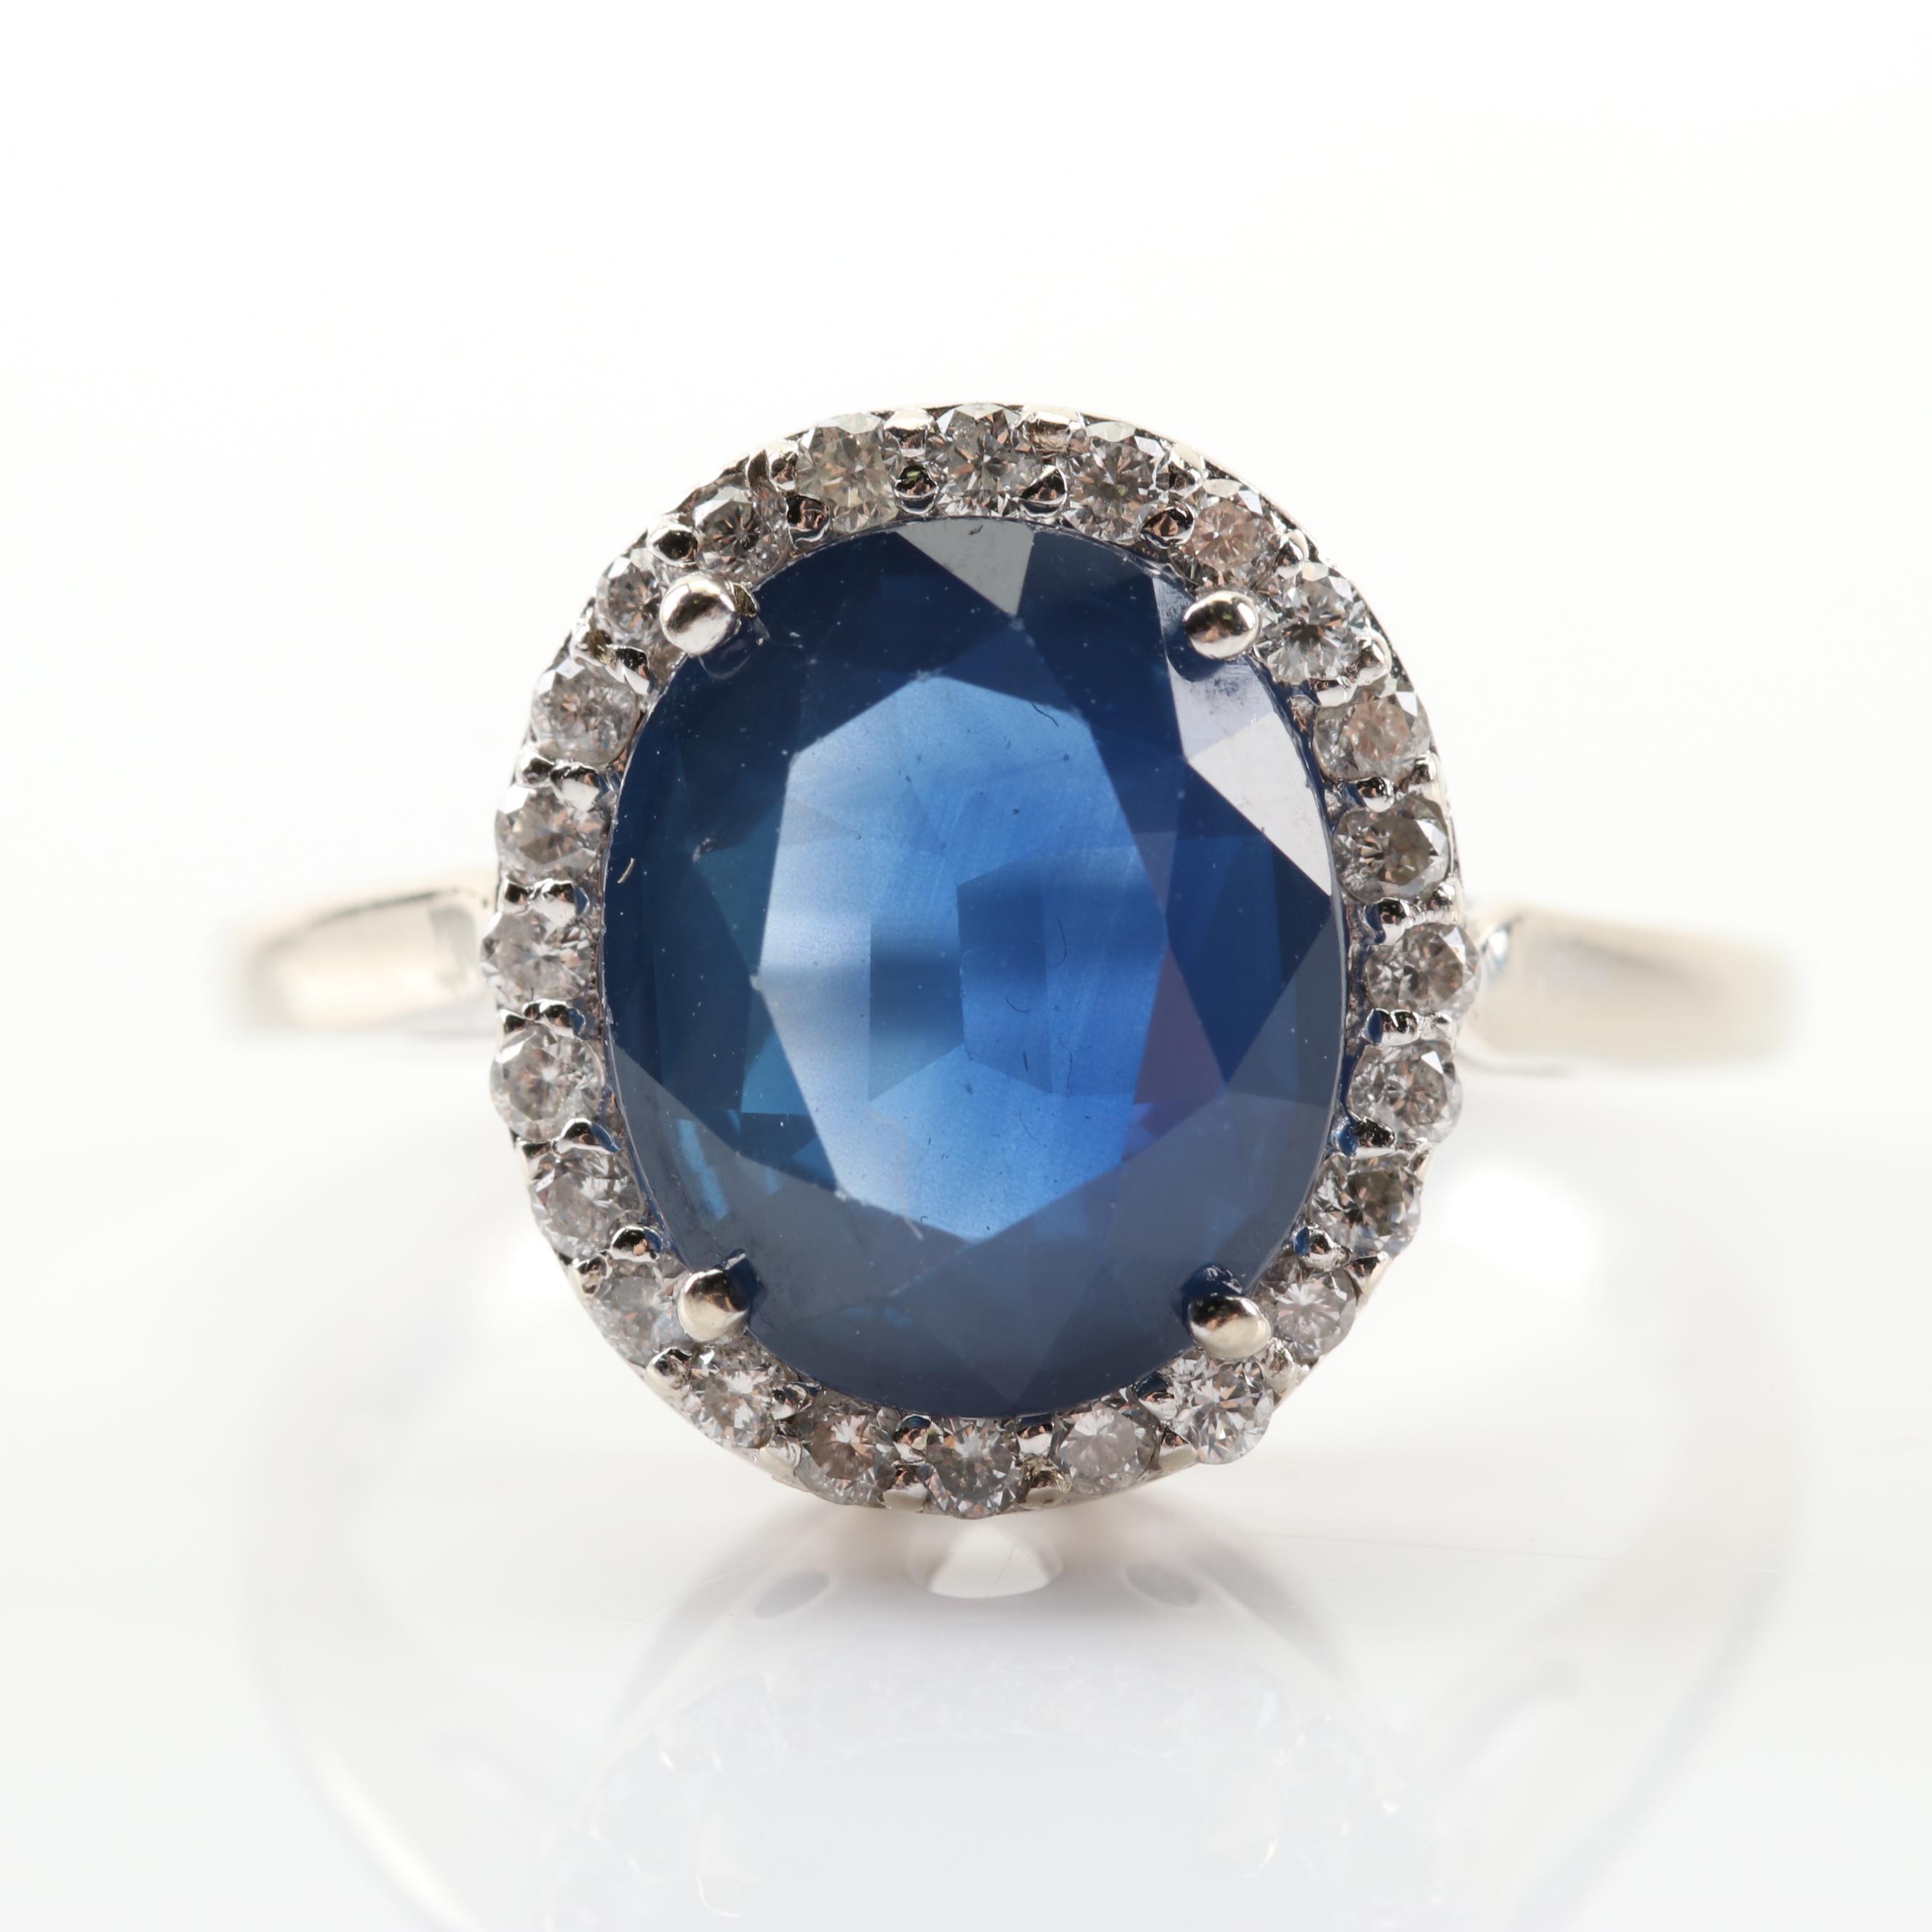 14K White Gold 3.90 CT Sapphire and Diamond Ring